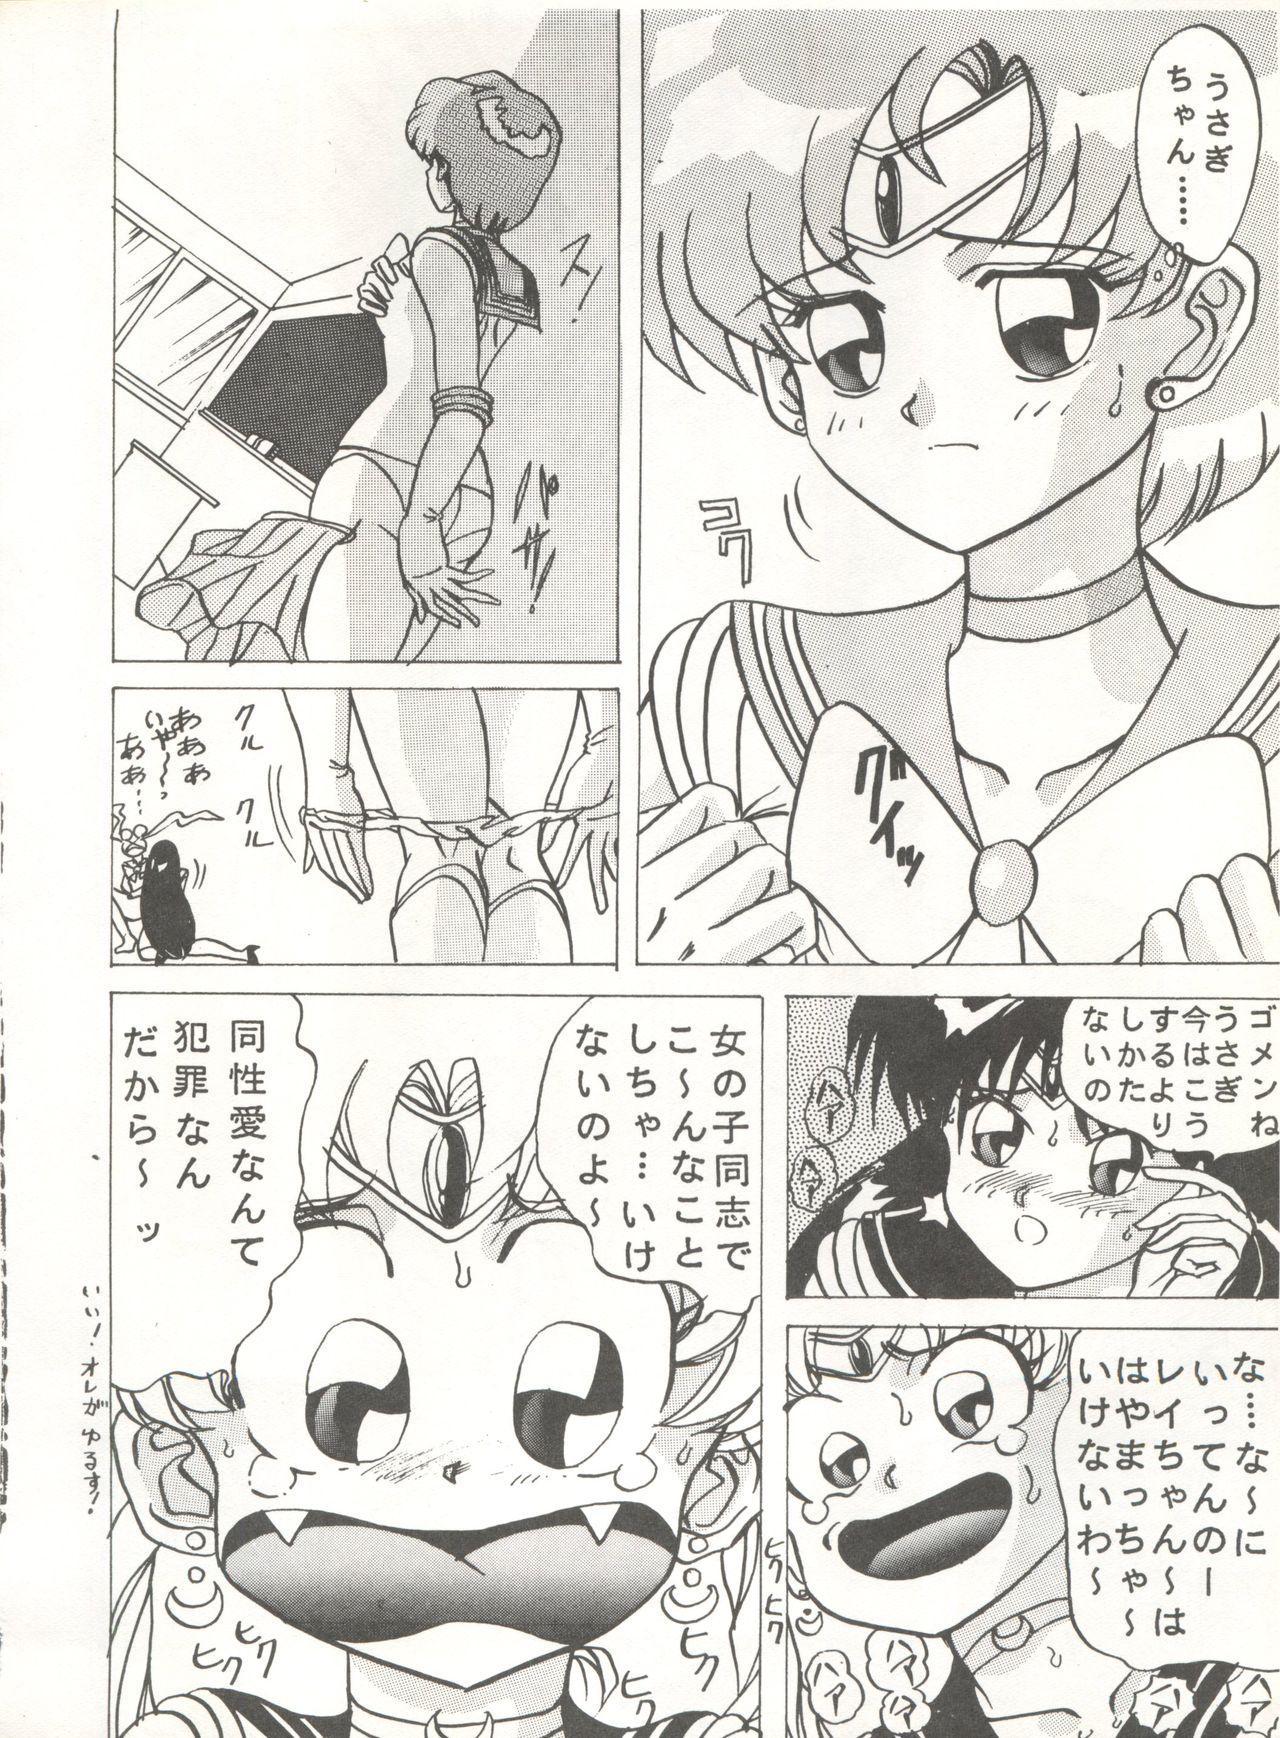 [Global One (MARO)] Sadistic 5 (Cutey Honey, Devilman, Sailor Moon), [Global One (MARO)] Sadistic (Dirty Pair, Fushigi no Umi no Nadia, Sailor Moon), [Studio Ikkatsumajin] .ribbon (Hime-chan's Ribbon) 47